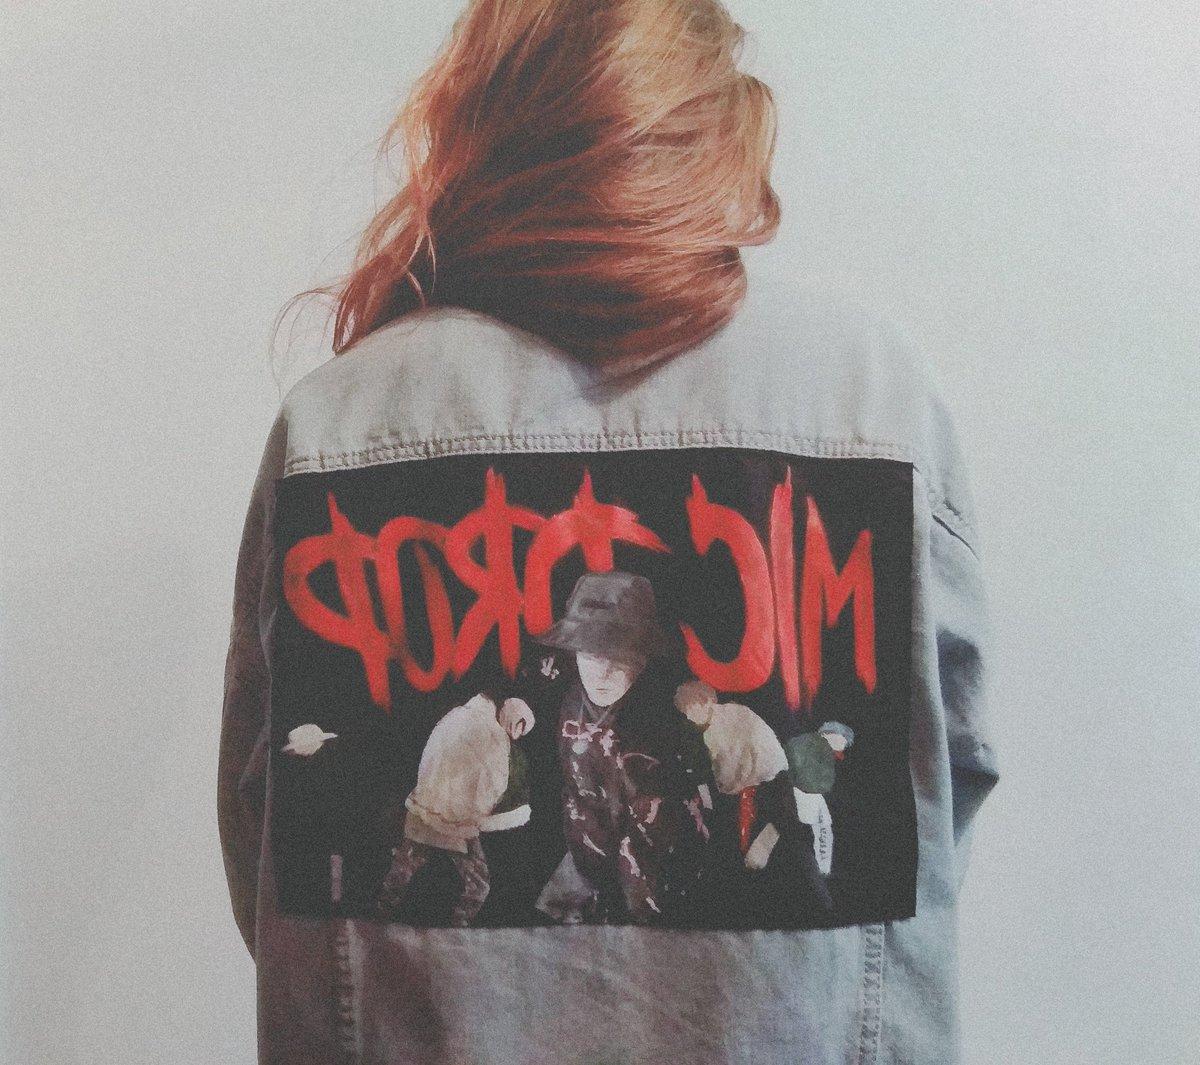 mic drop hand painted jacket @BTS_twt #btsfanart i tried  <br>http://pic.twitter.com/cniZX3DpZd